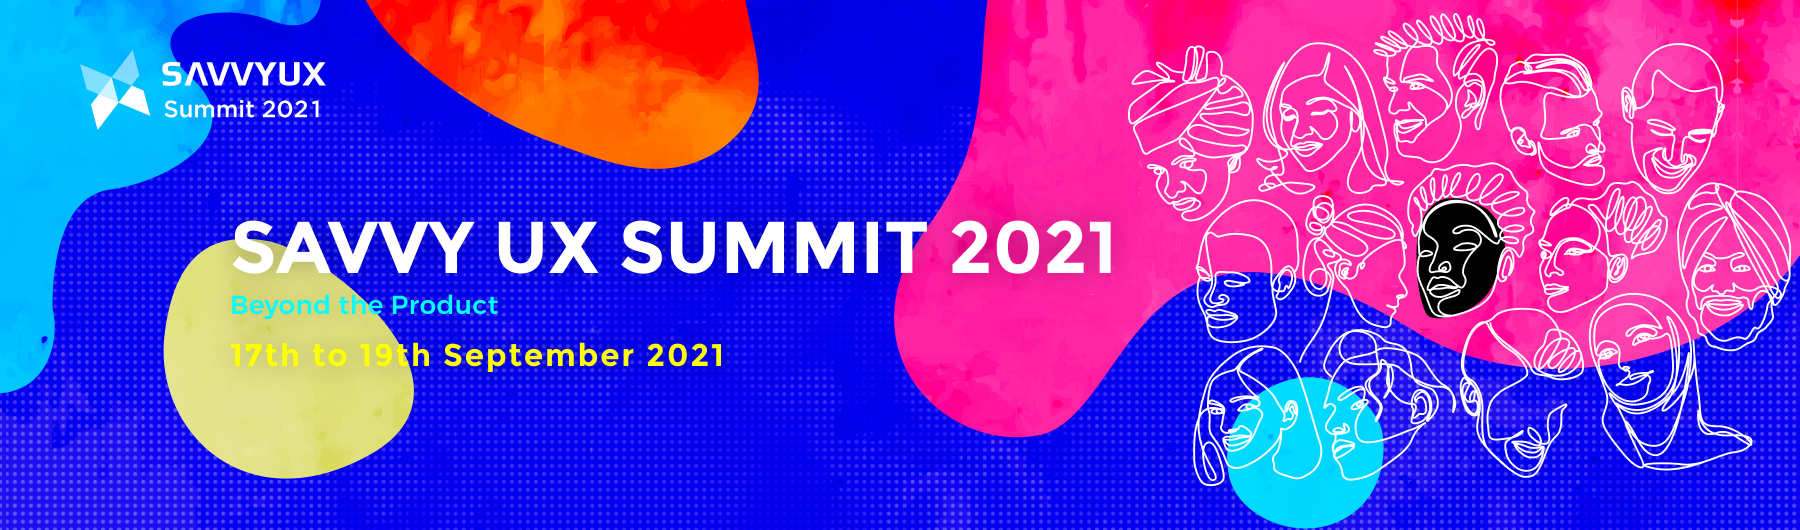 Savvy UX Summit 2021